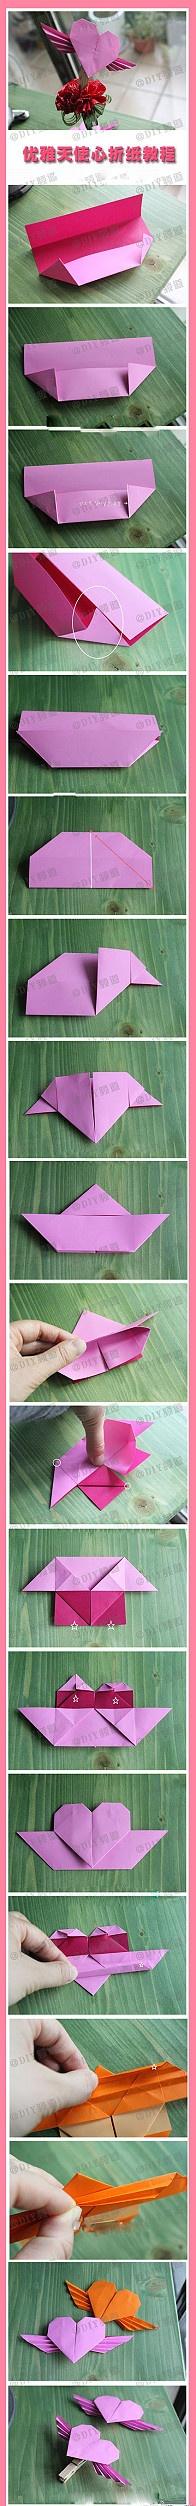 The elegant Angel Heart origami tutorial